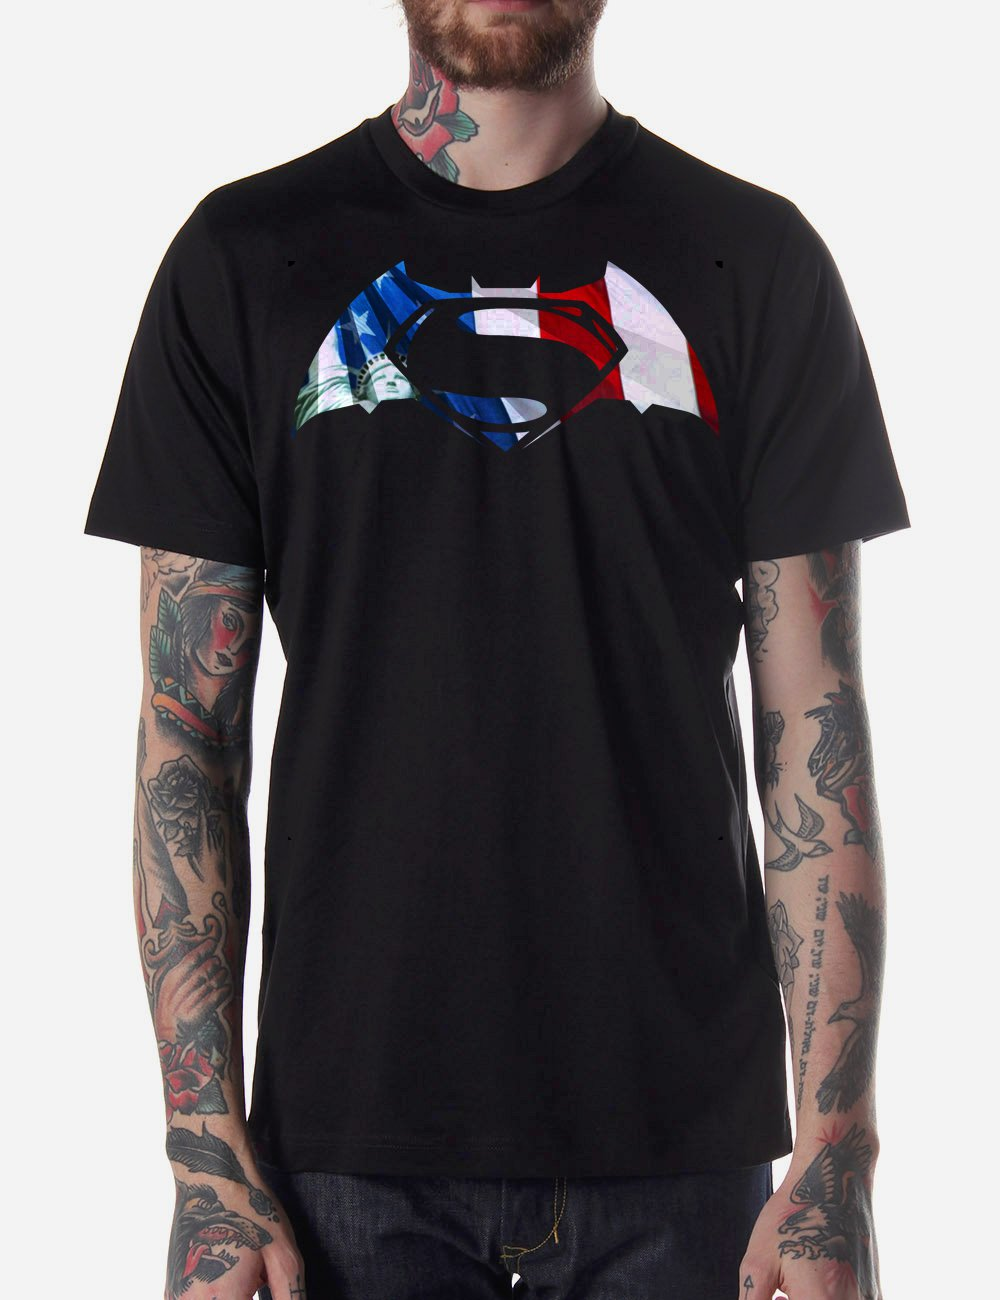 Black Men Tshirt Superman vs Batman America Justice Black Tshirt For Men